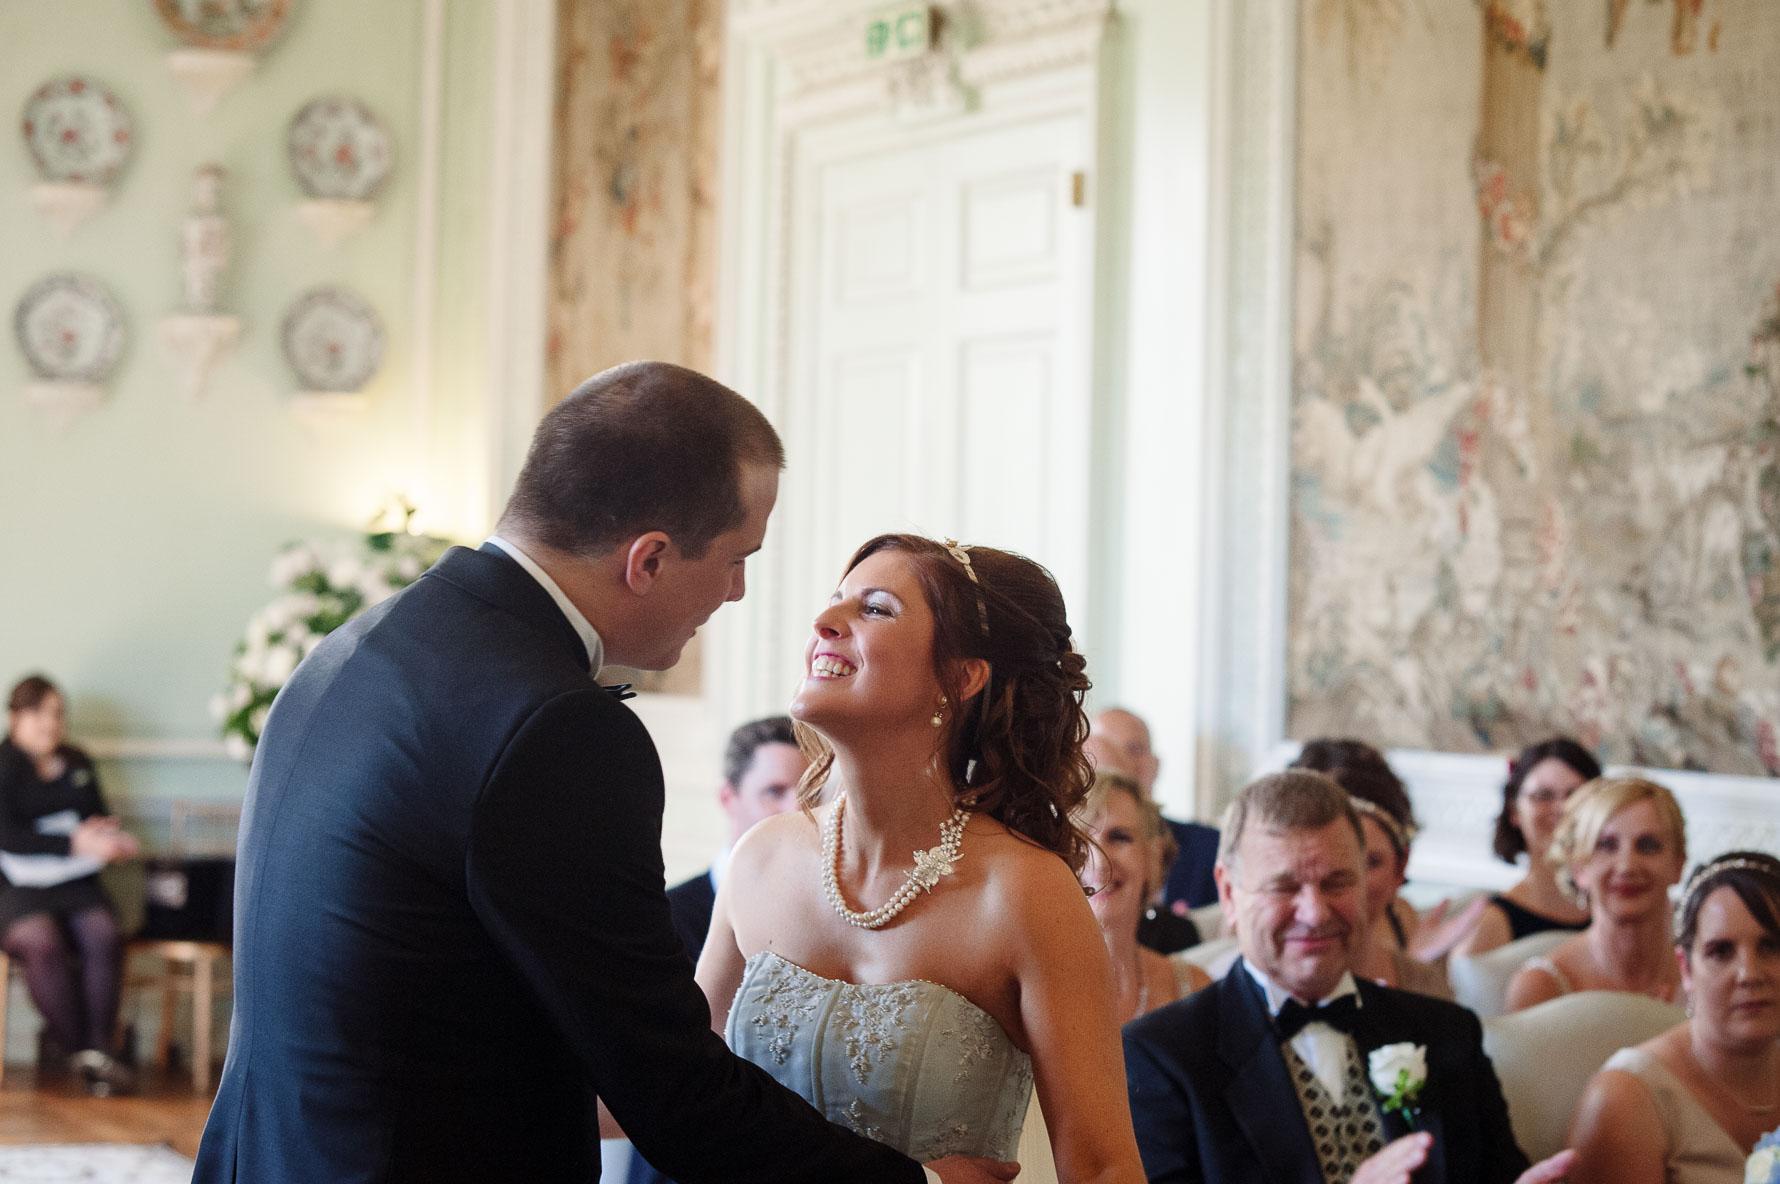 Leeds Castle Wedding18-20140919 0585